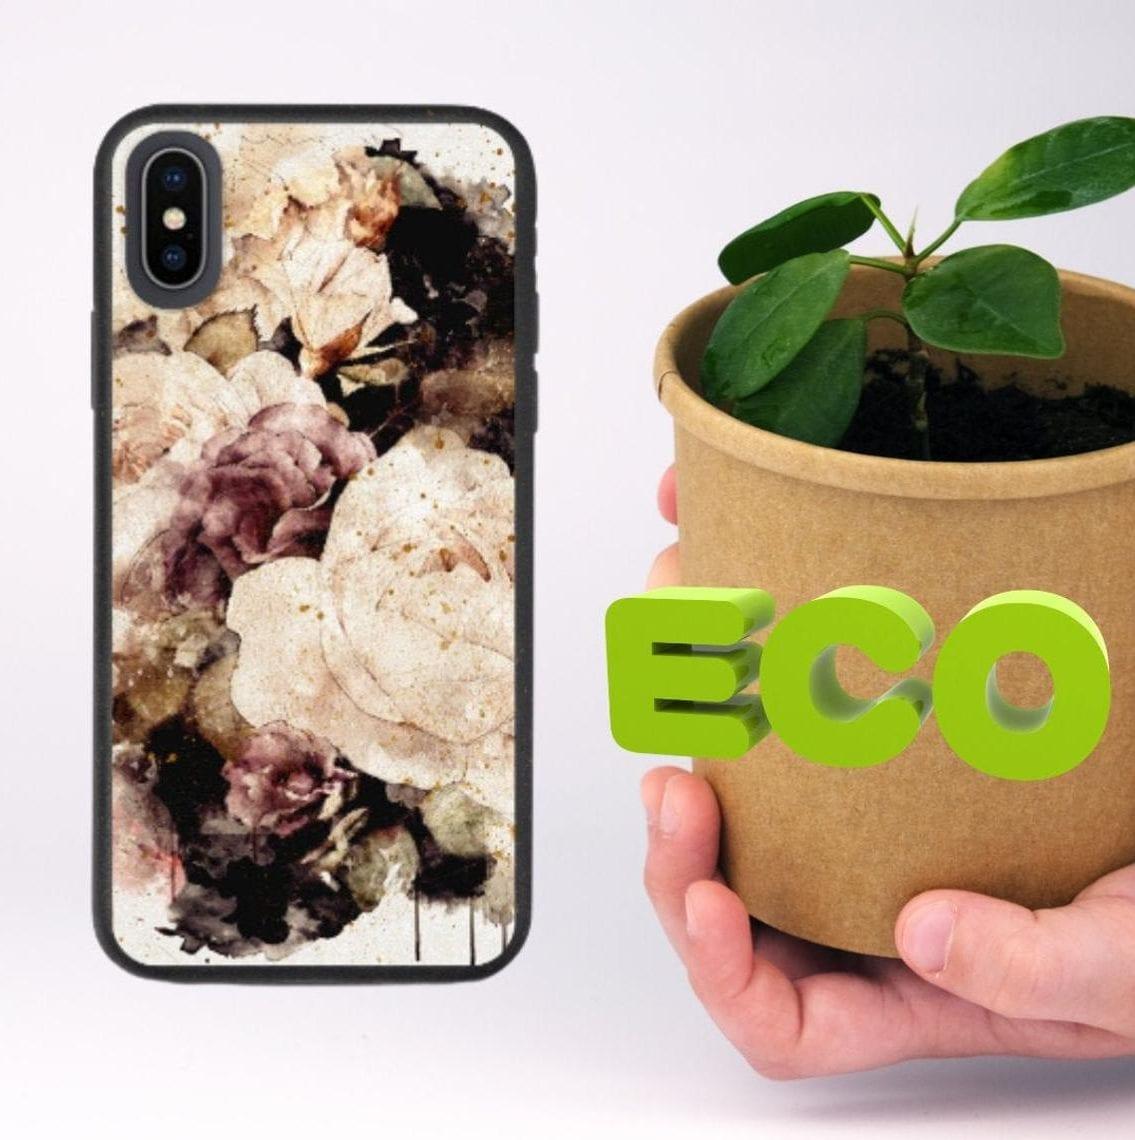 eco-friendly gift idea biodegradable phone case